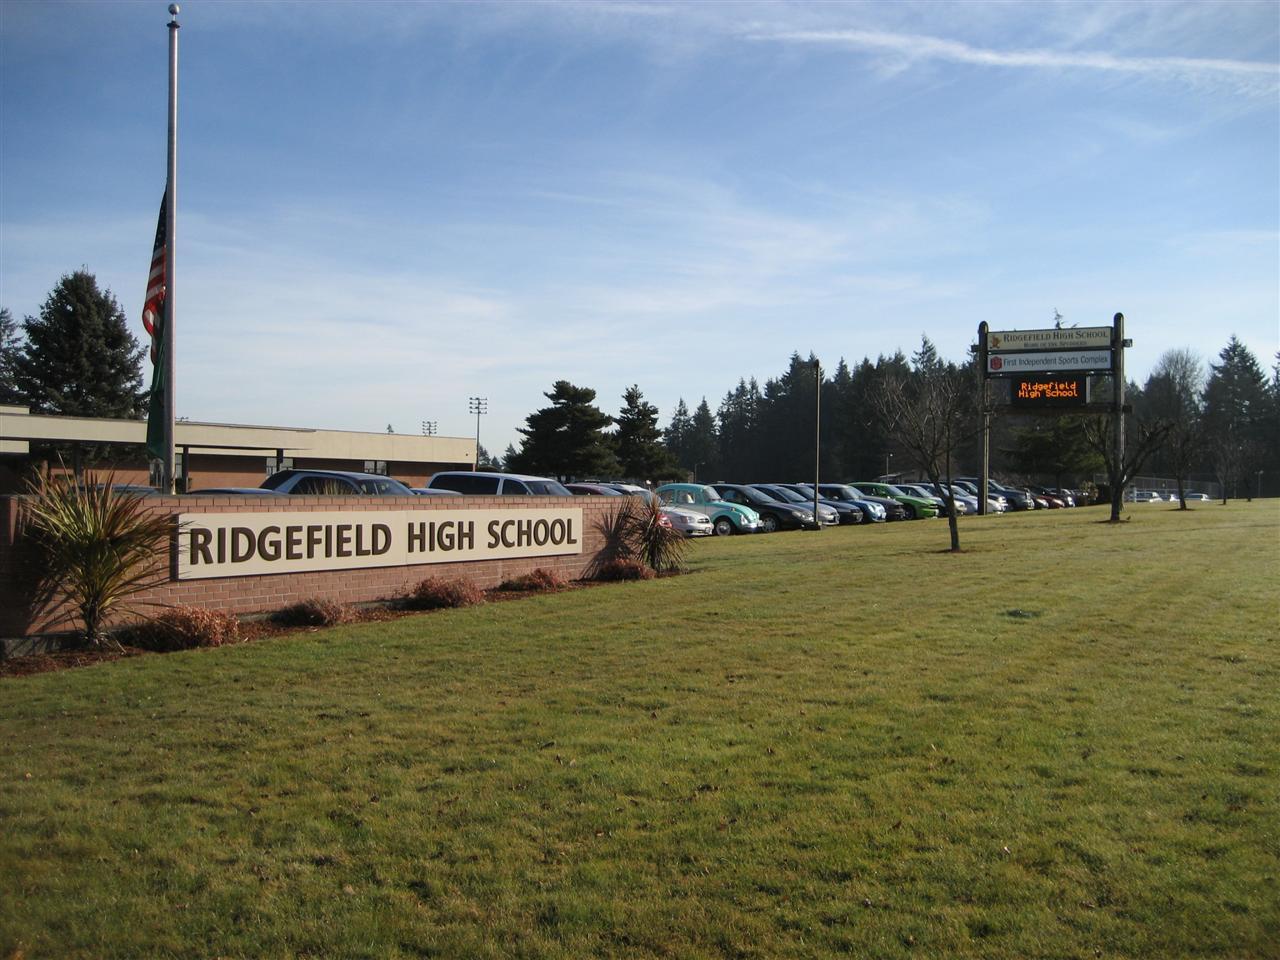 Ridgefield High School 2008.3